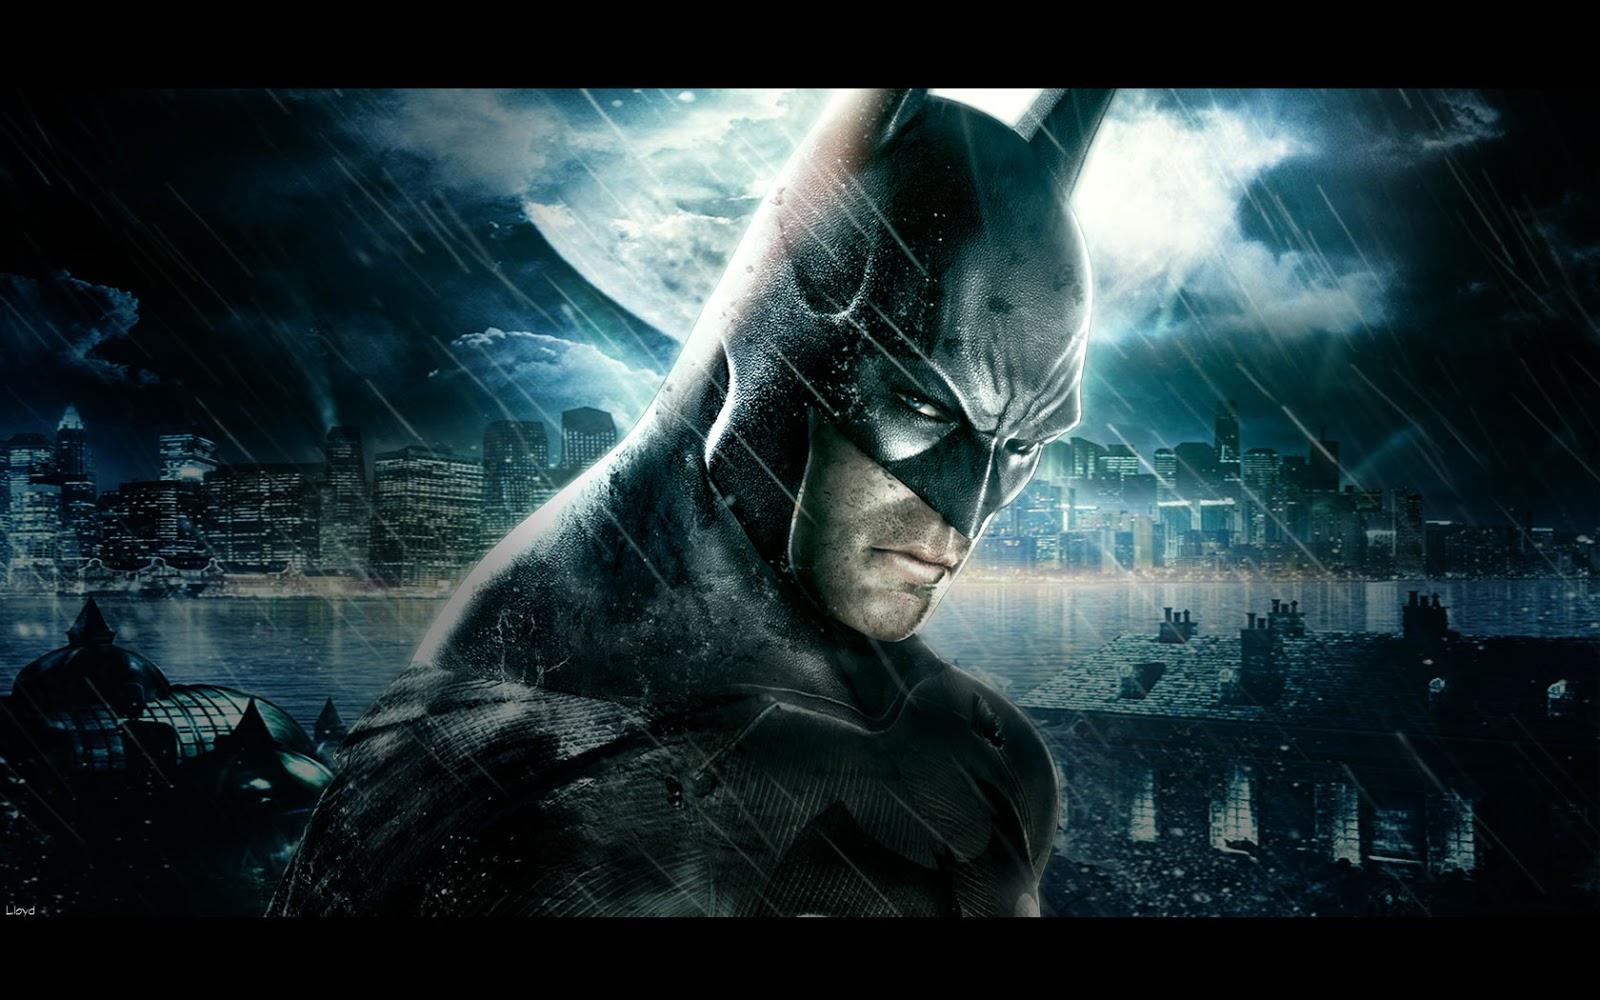 Papel De Parede Para Quarto Batman ~ batman game batman hd papel de parede batman